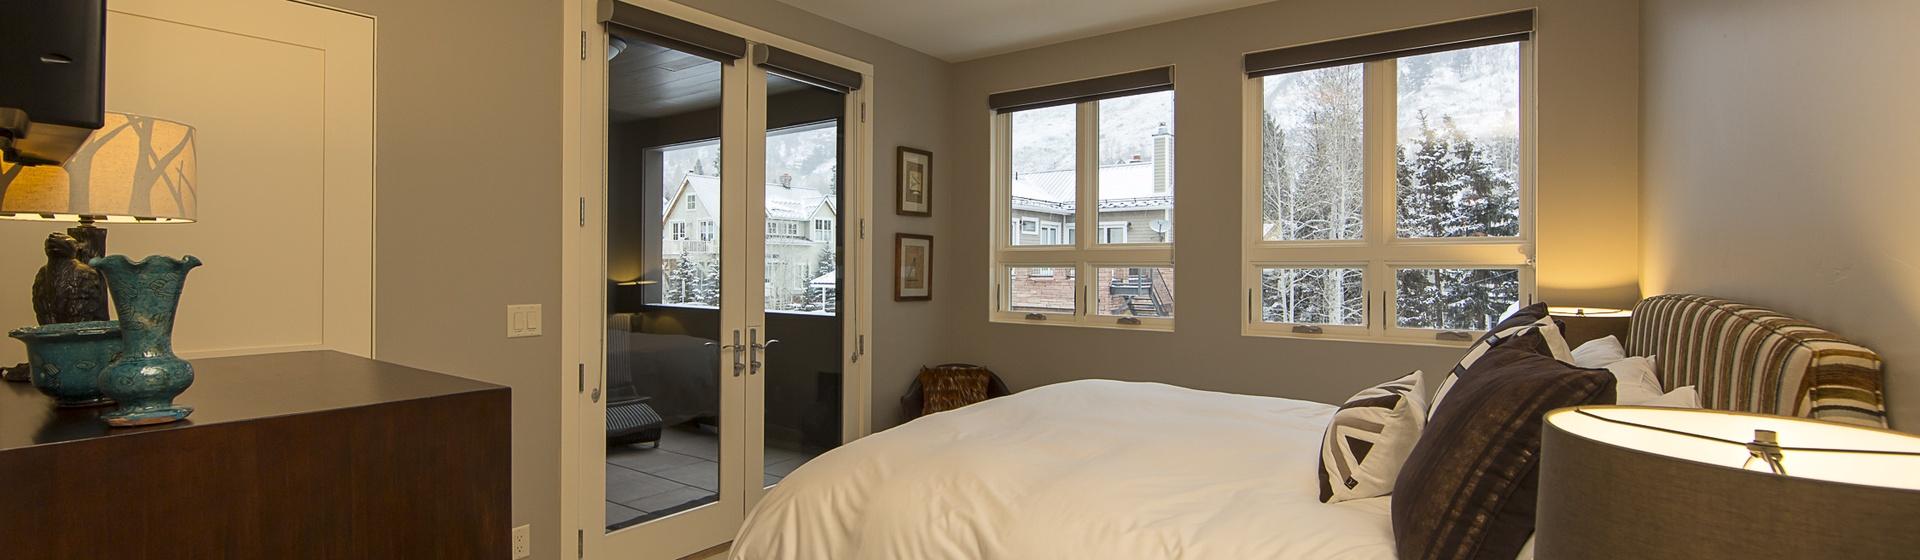 28-Telluride-Trulux-Penthouse-MasterBedroom2.jpg